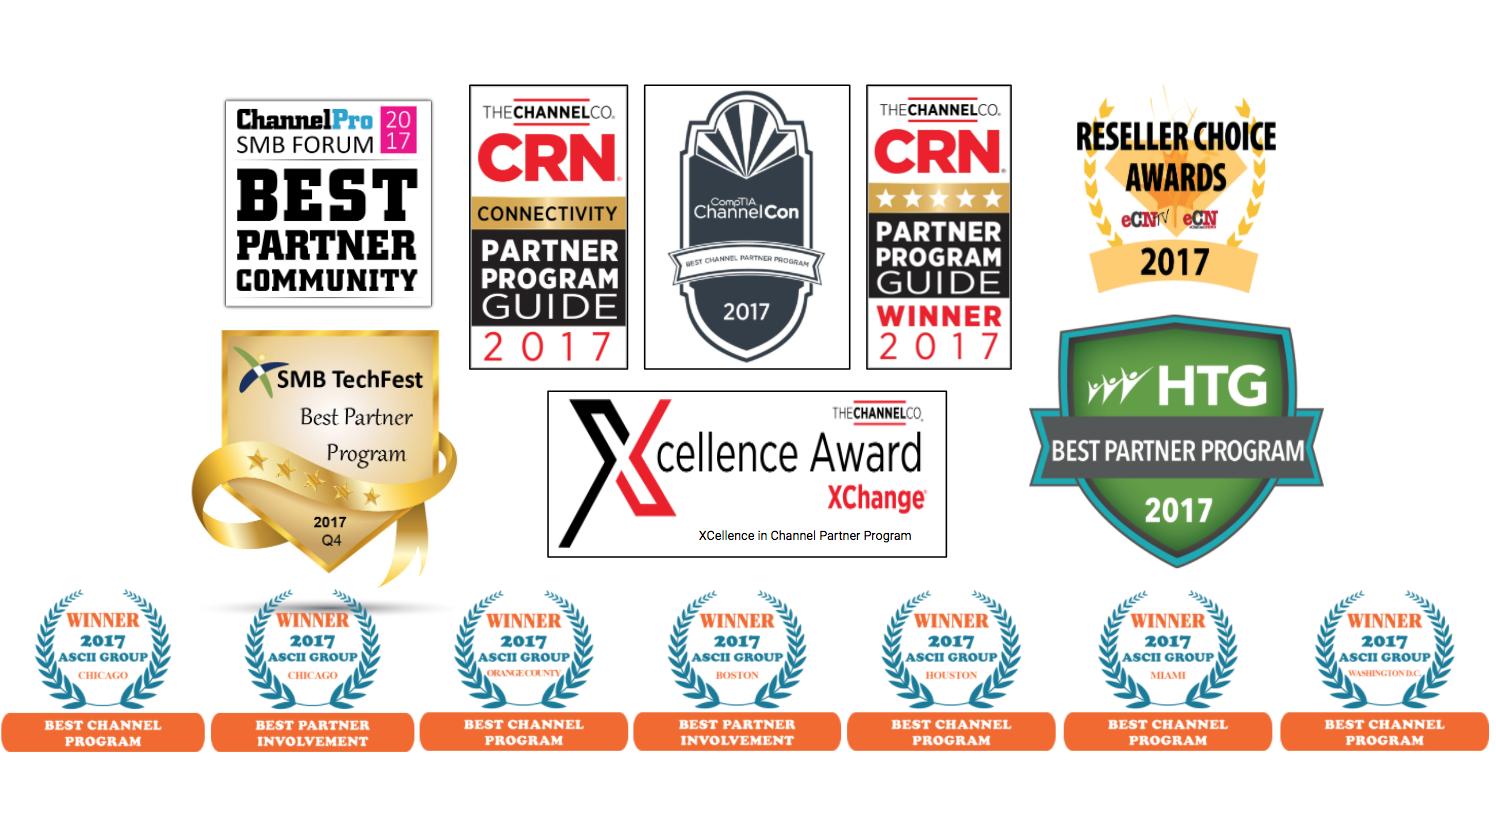 2017 Partner Program Awards